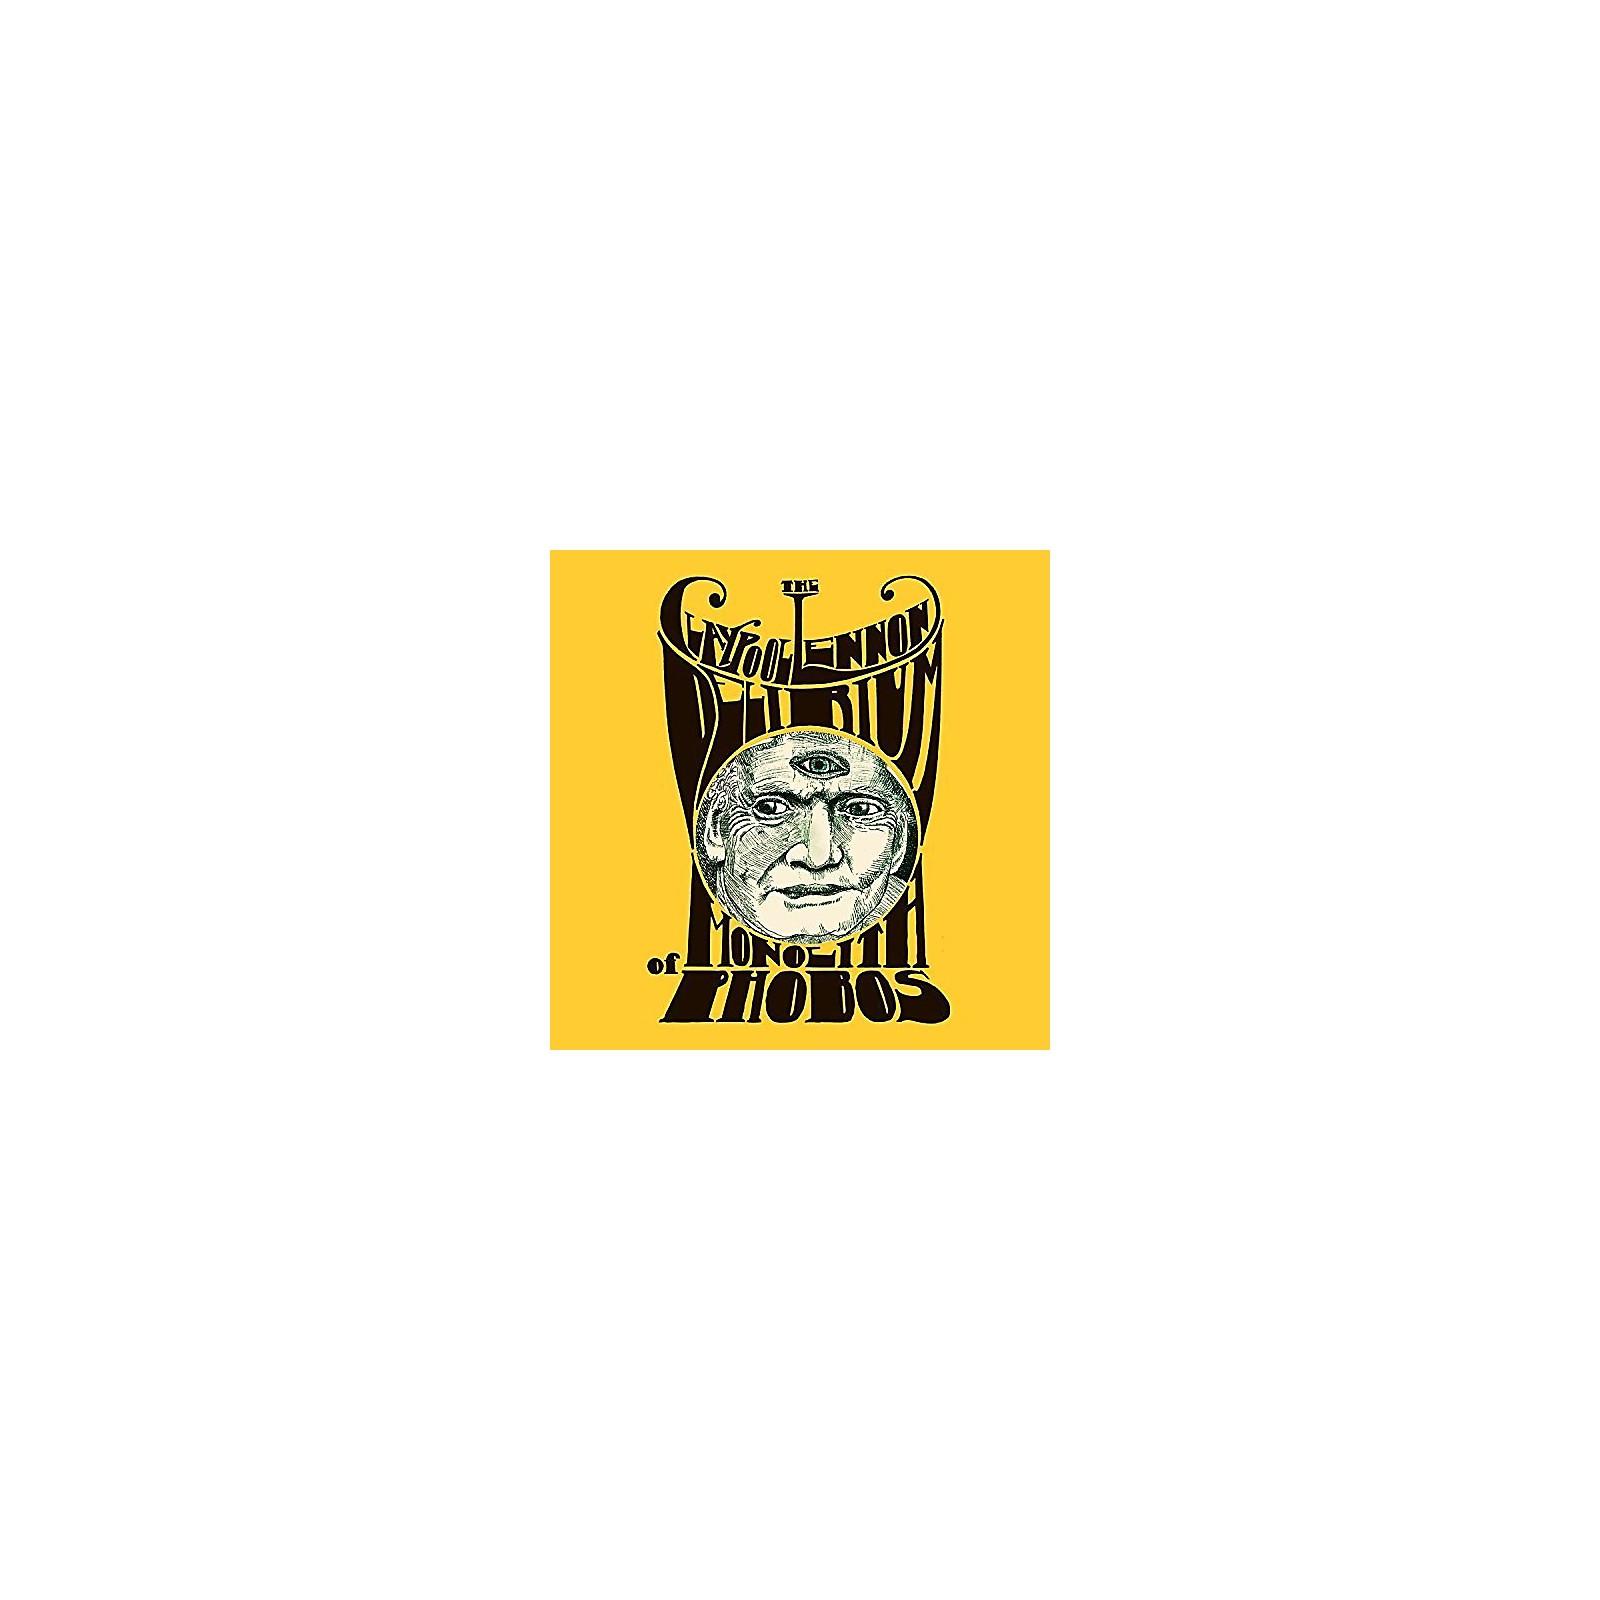 Alliance Claypool Lennon Delirium - Monolith Of Phobos